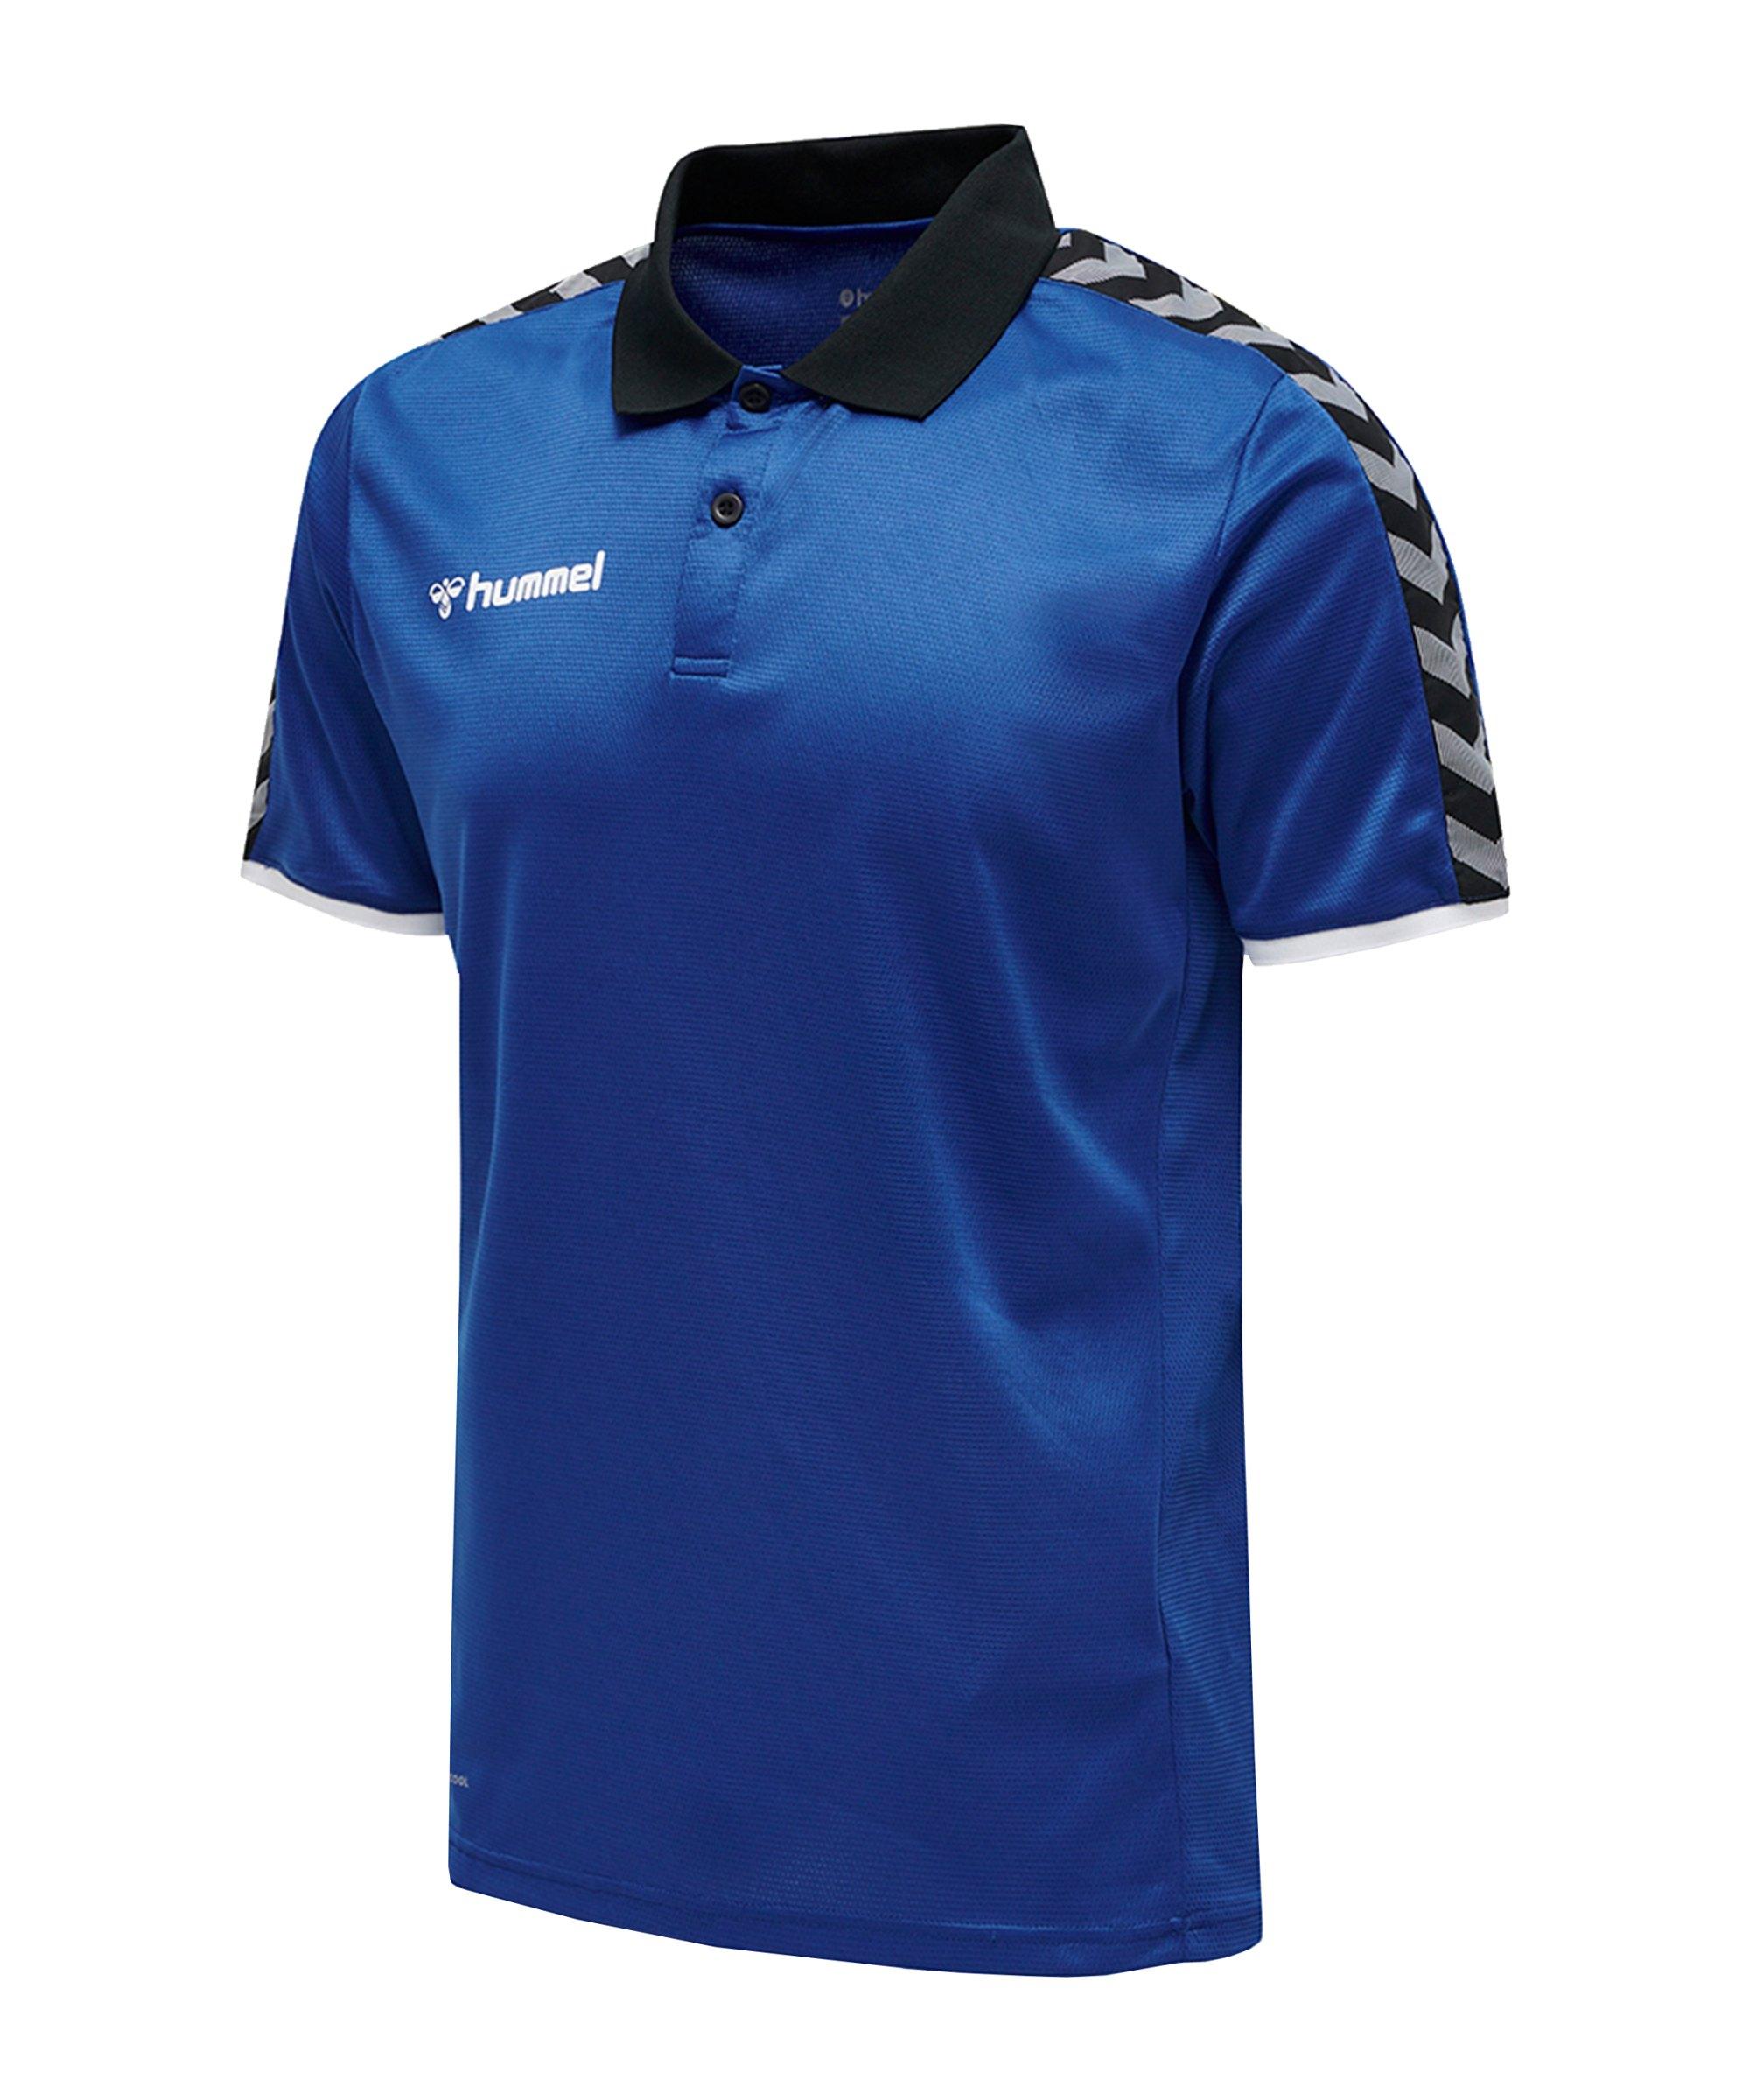 Hummel Authentic Functional Poloshirt F7045 - blau